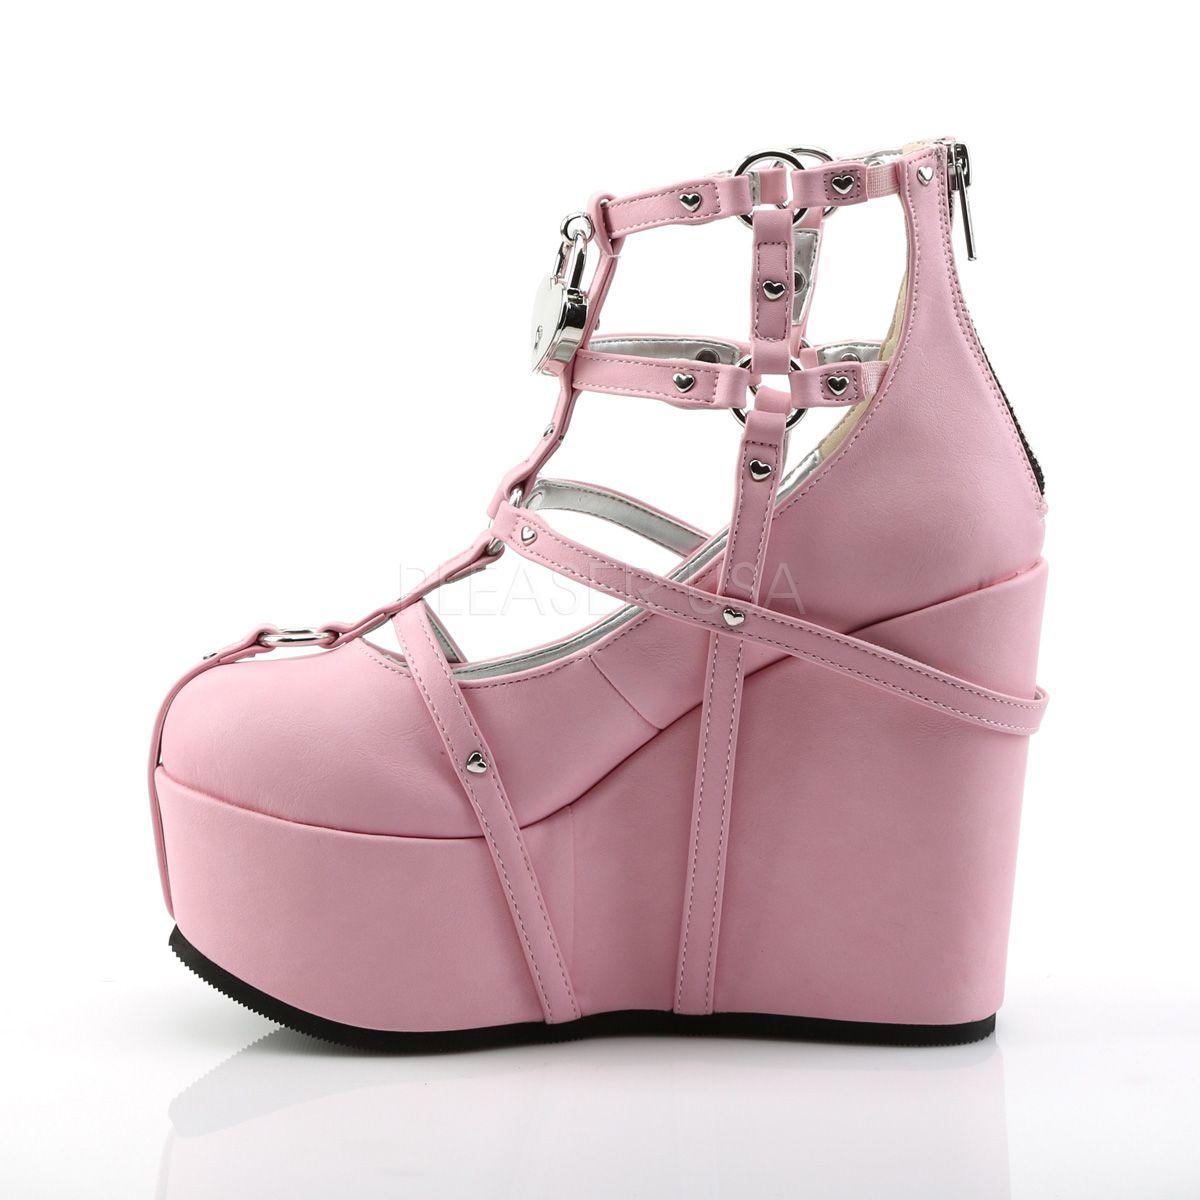 Sapato Poison 25-2 Baby Pink - Demonia (encomenda)